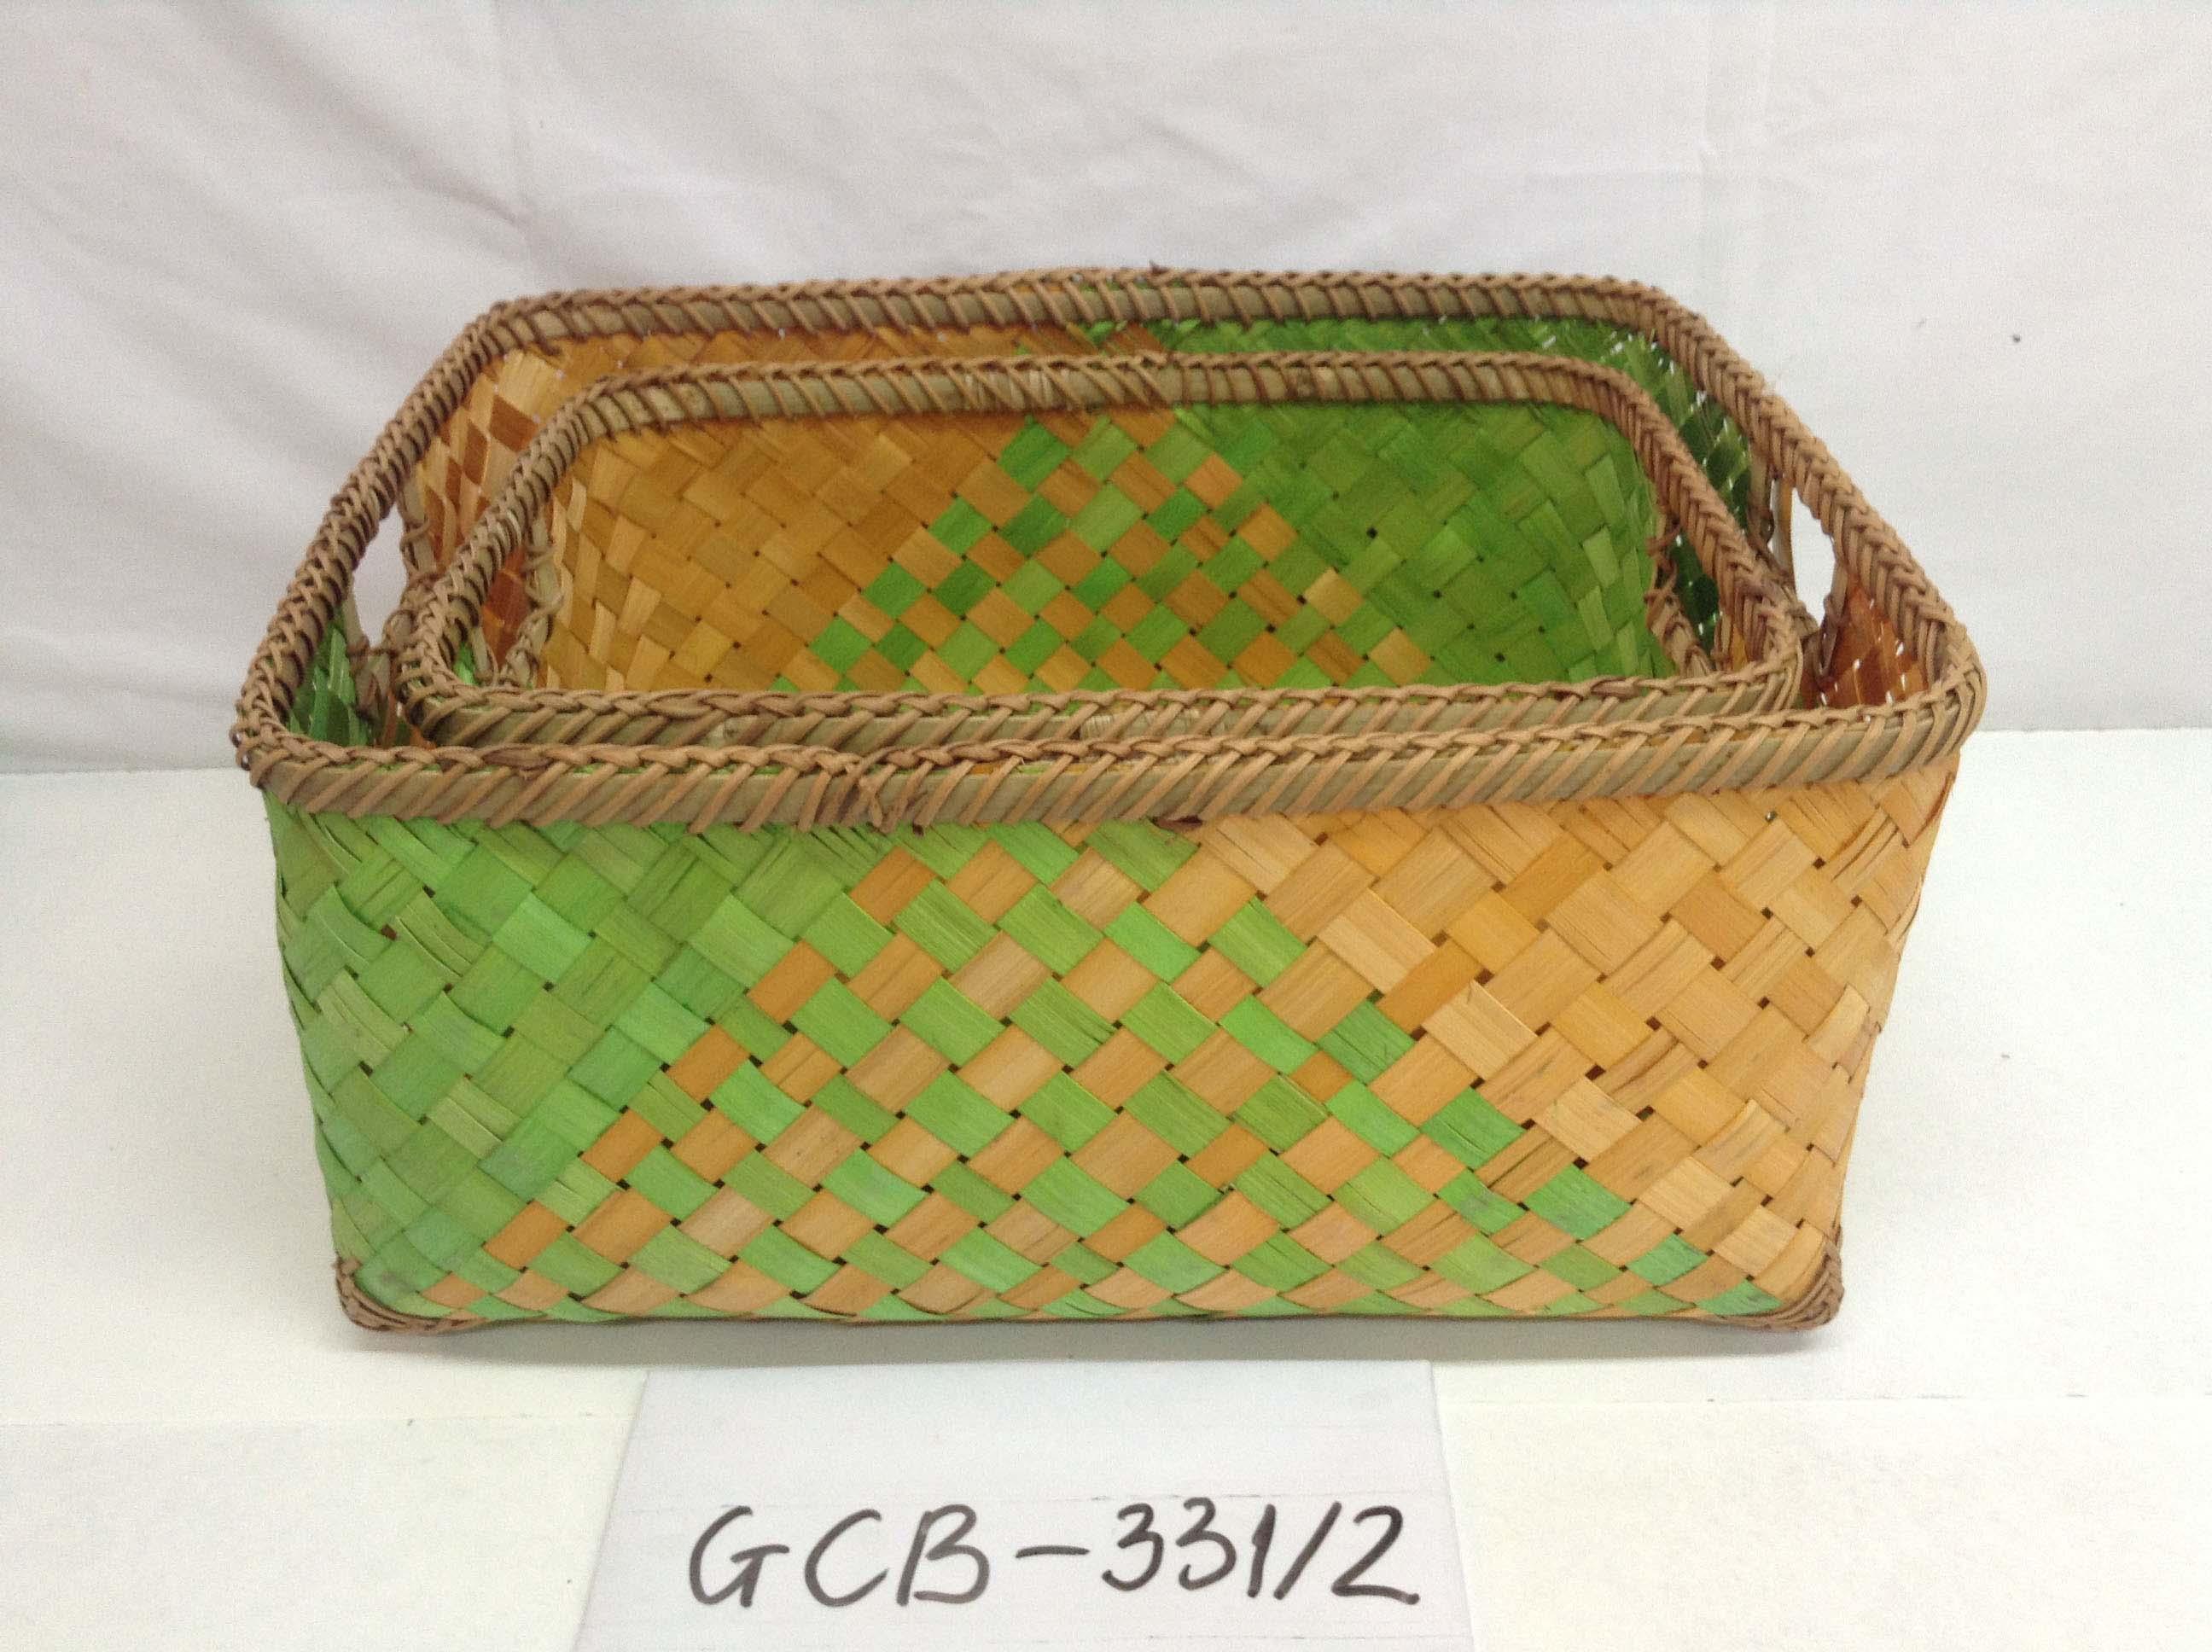 GCB-331-2